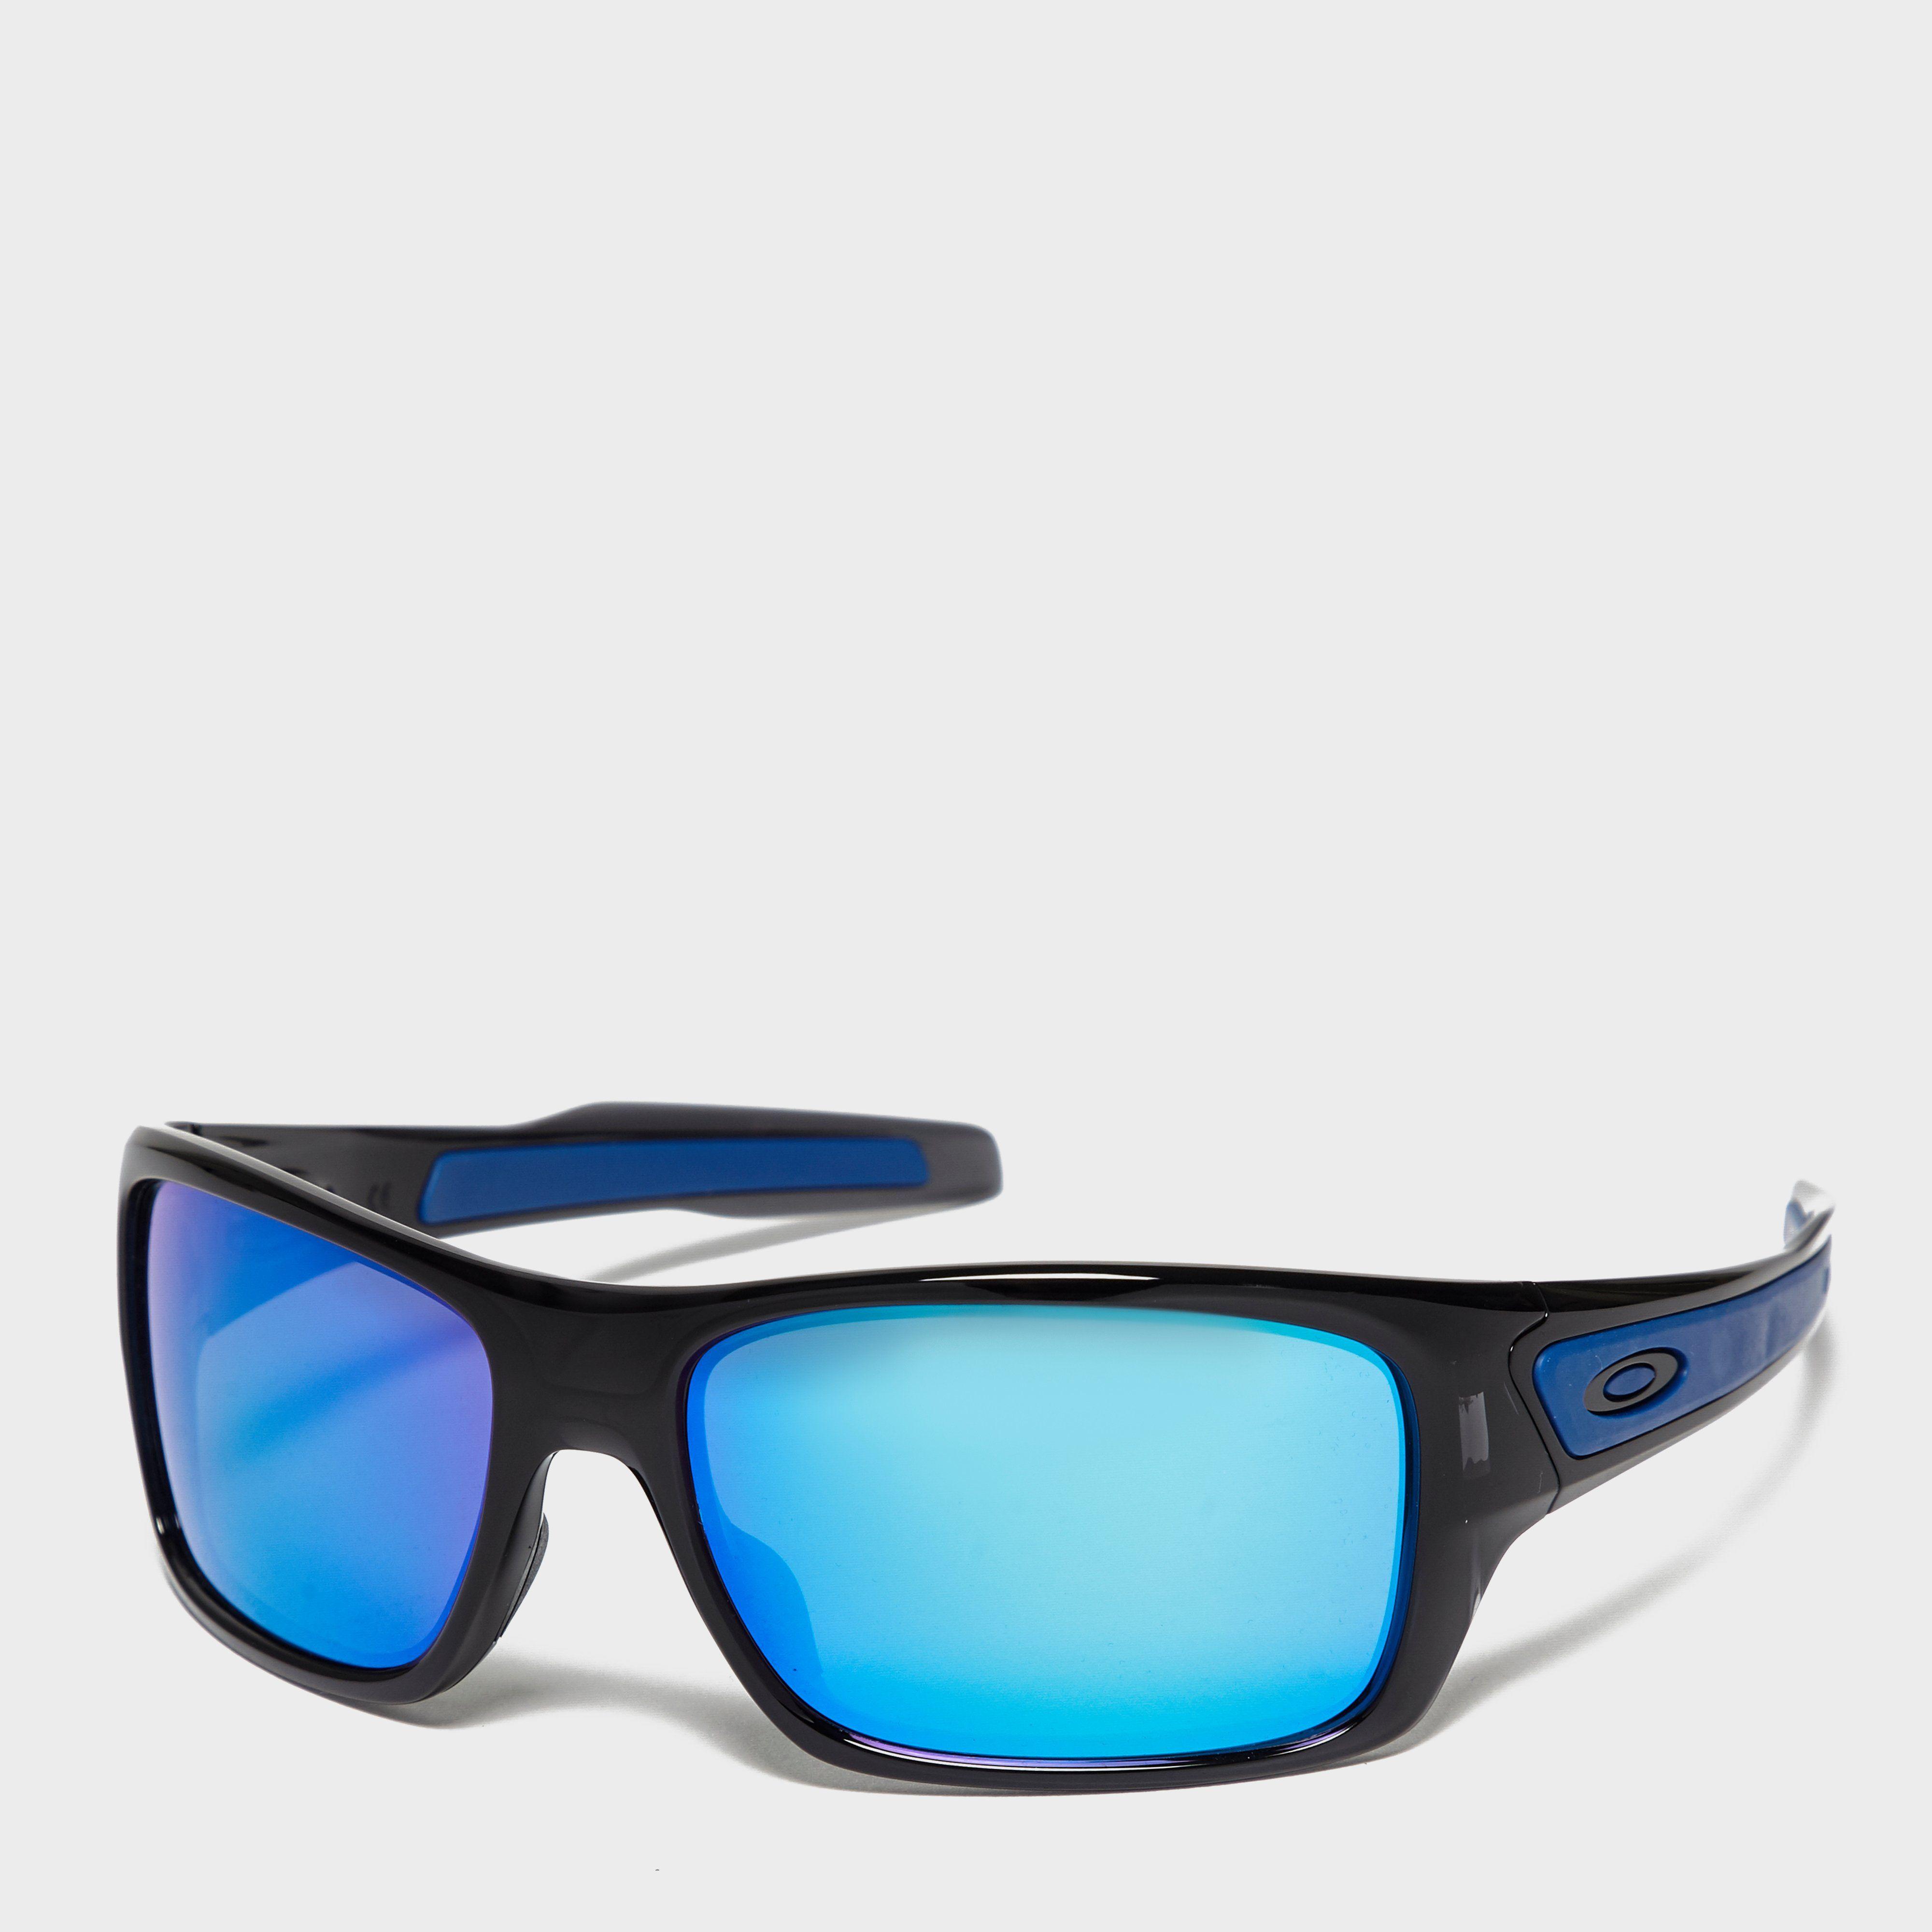 OAKLEY Turbine™ Sapphire Iridium Sunglasses